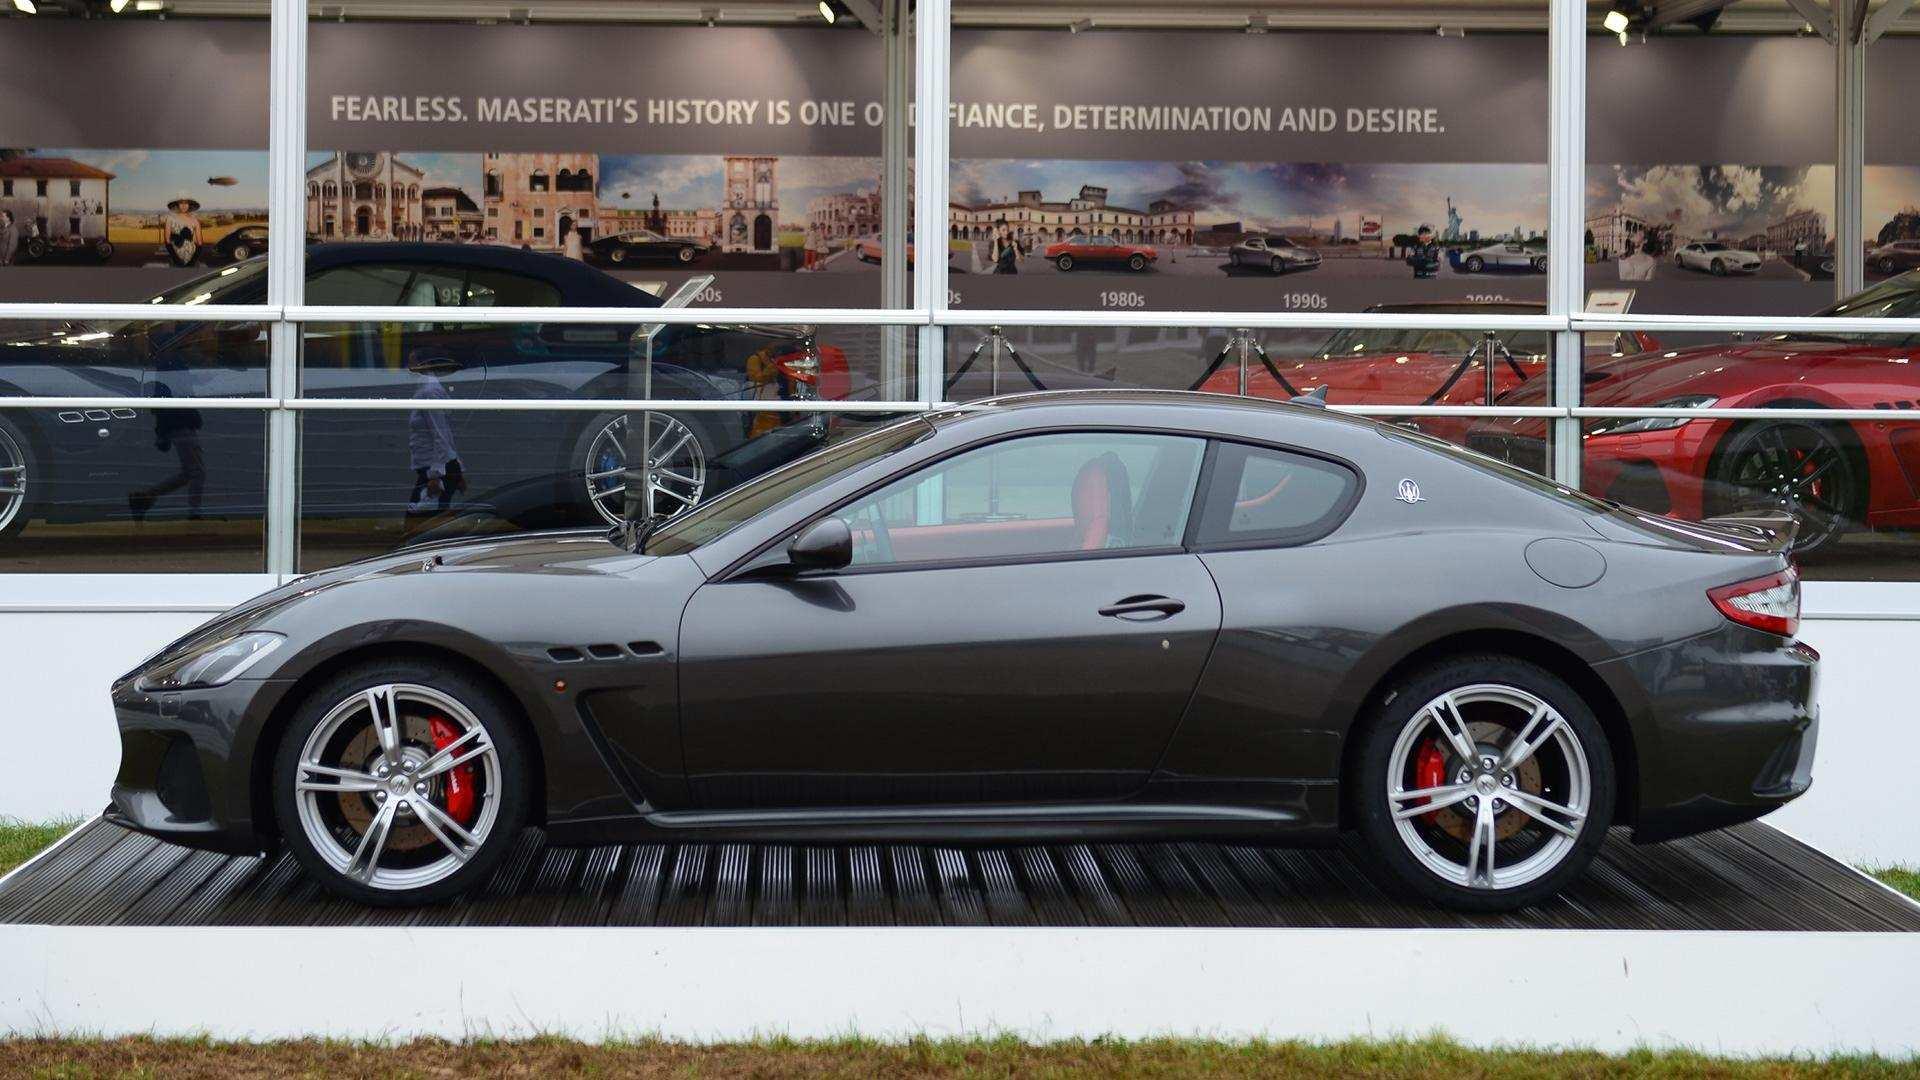 23 New Maserati Gt 2020 Pricing with Maserati Gt 2020